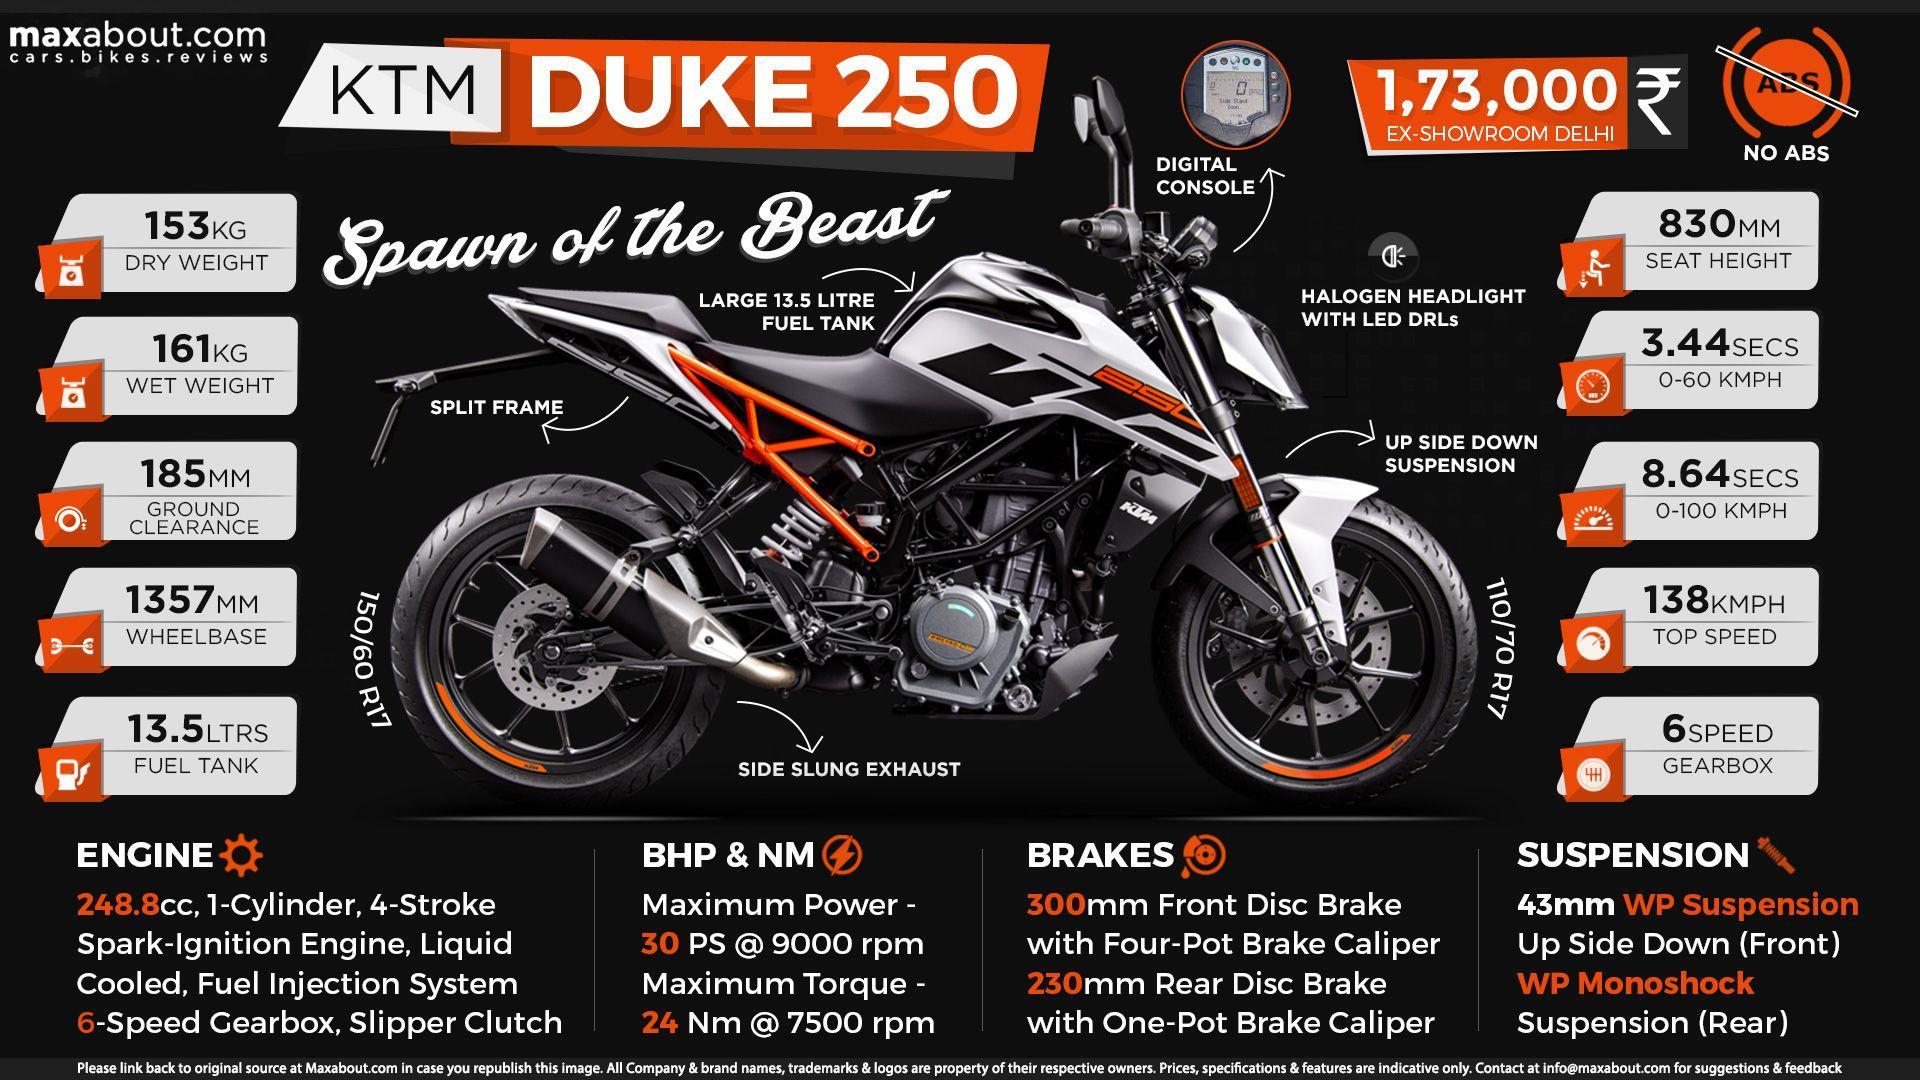 KTM 250 Duke Wallpapers - Wallpaper Cave